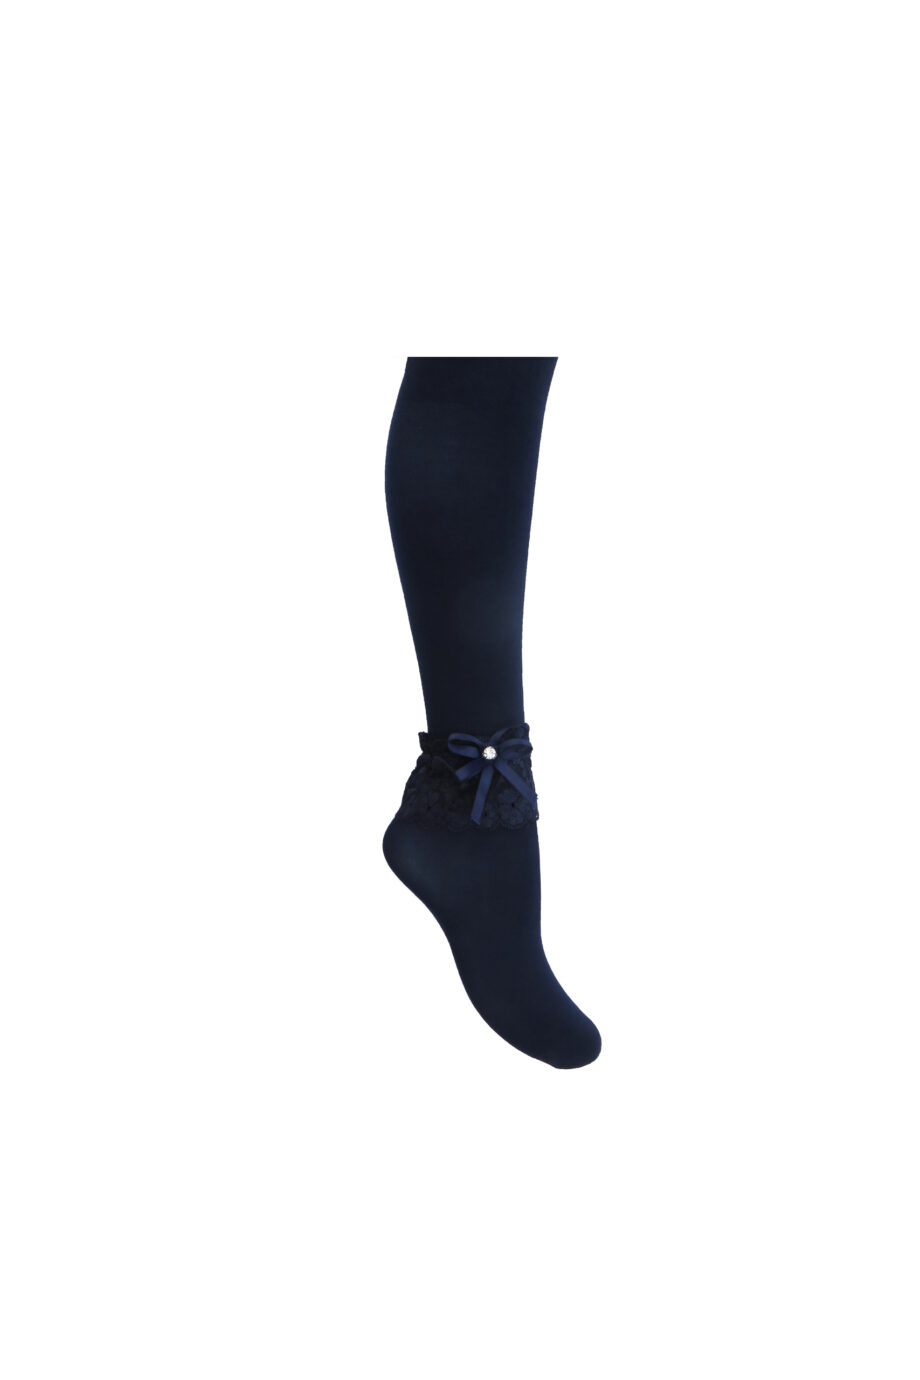 جوراب شلواری بچه گانه لب تور 1